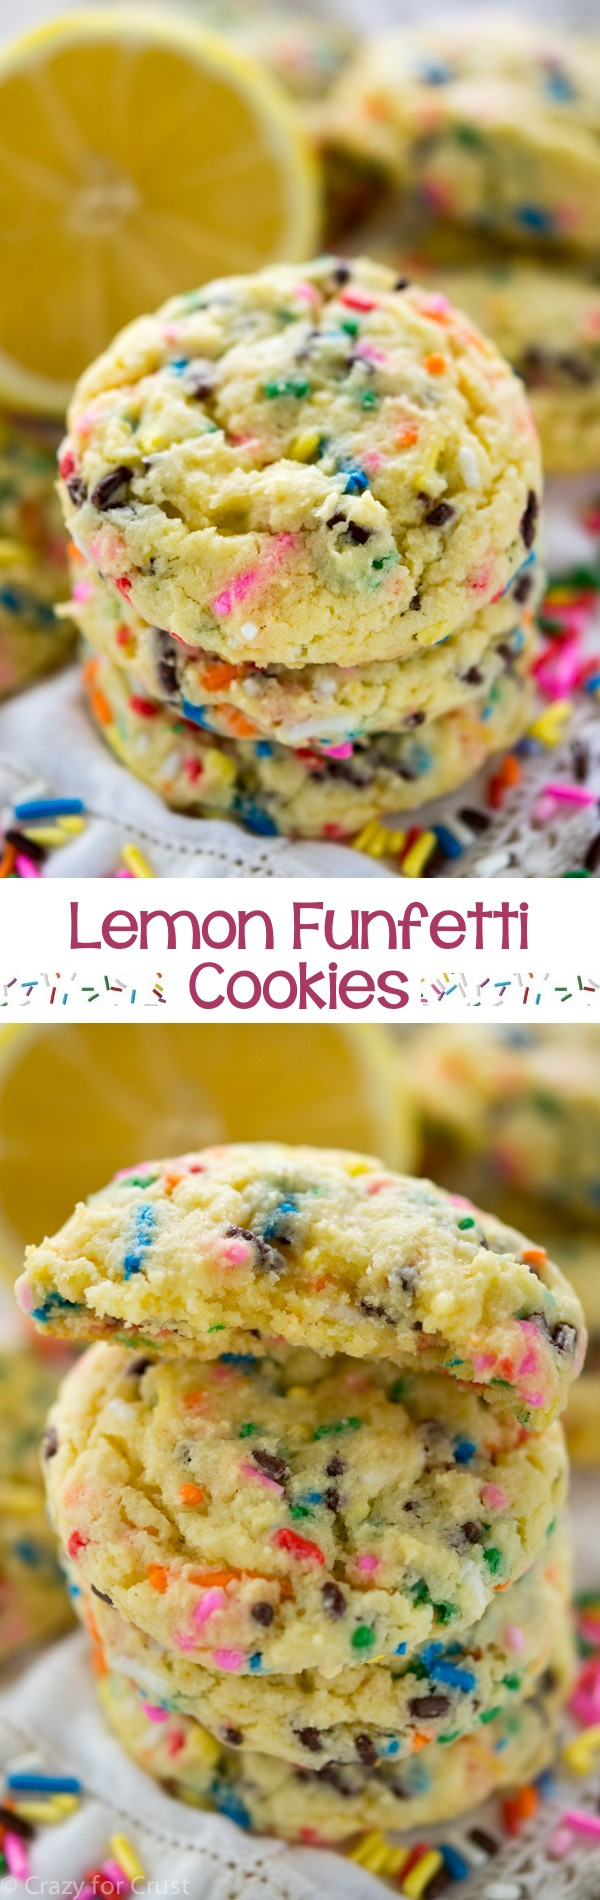 Lemon Funfetti Cookies are full of lemon and cake batter flavor...with sprinkles!